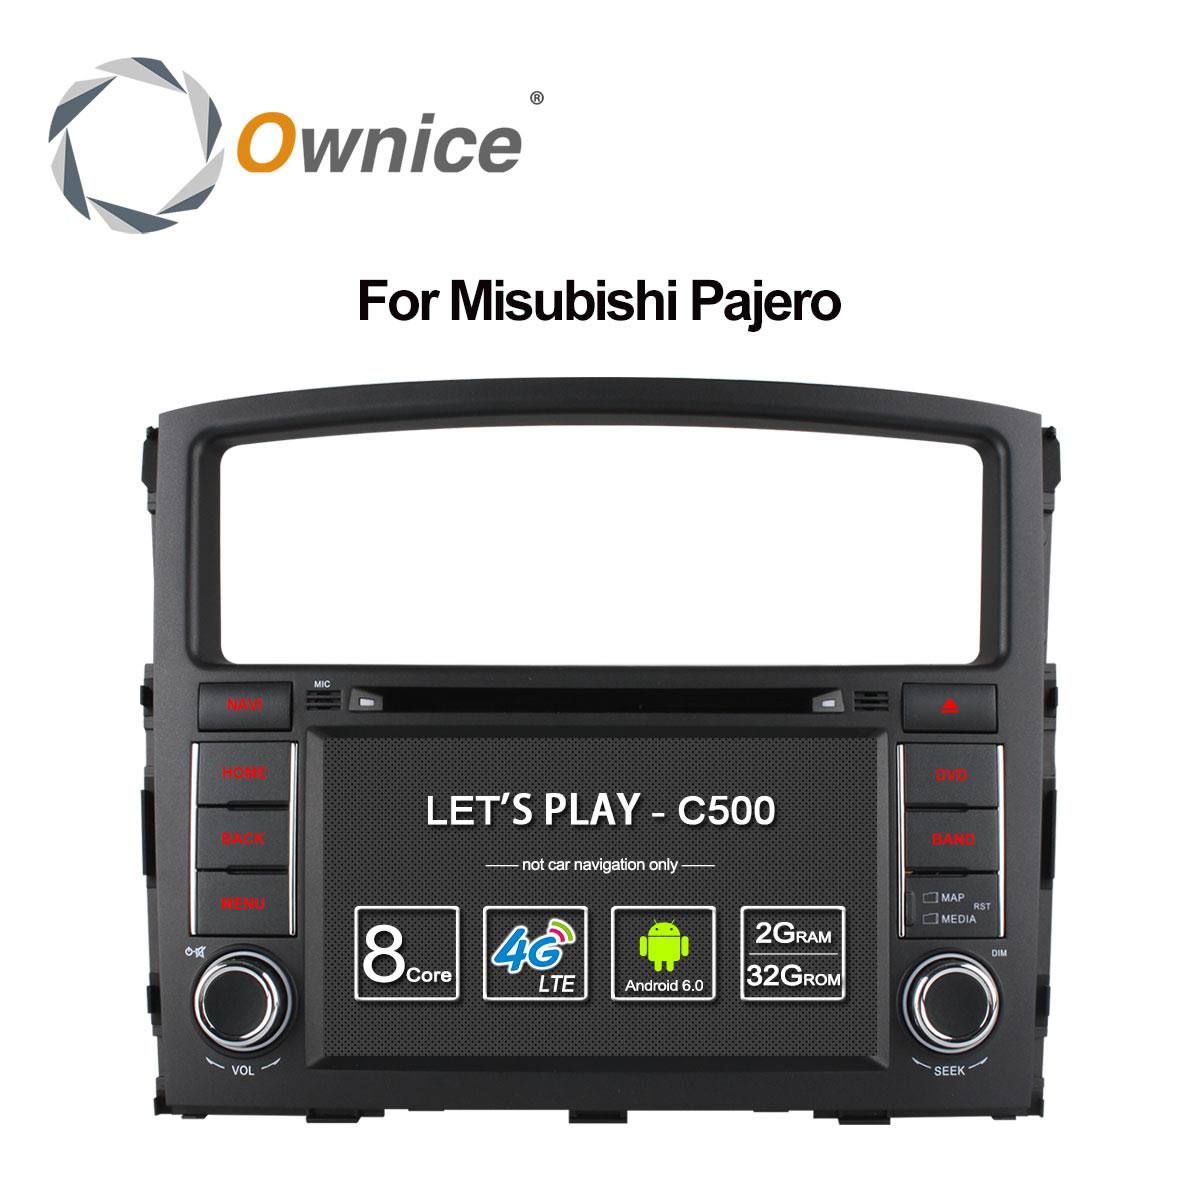 Ownice C500 Octa 8 core Android 6.0 для Mitsubishi Pajero V97 V93 2006-2015 dvd-плеер GPS Navi поддержка 4 г dab + TPMS 32 г Встроенная память